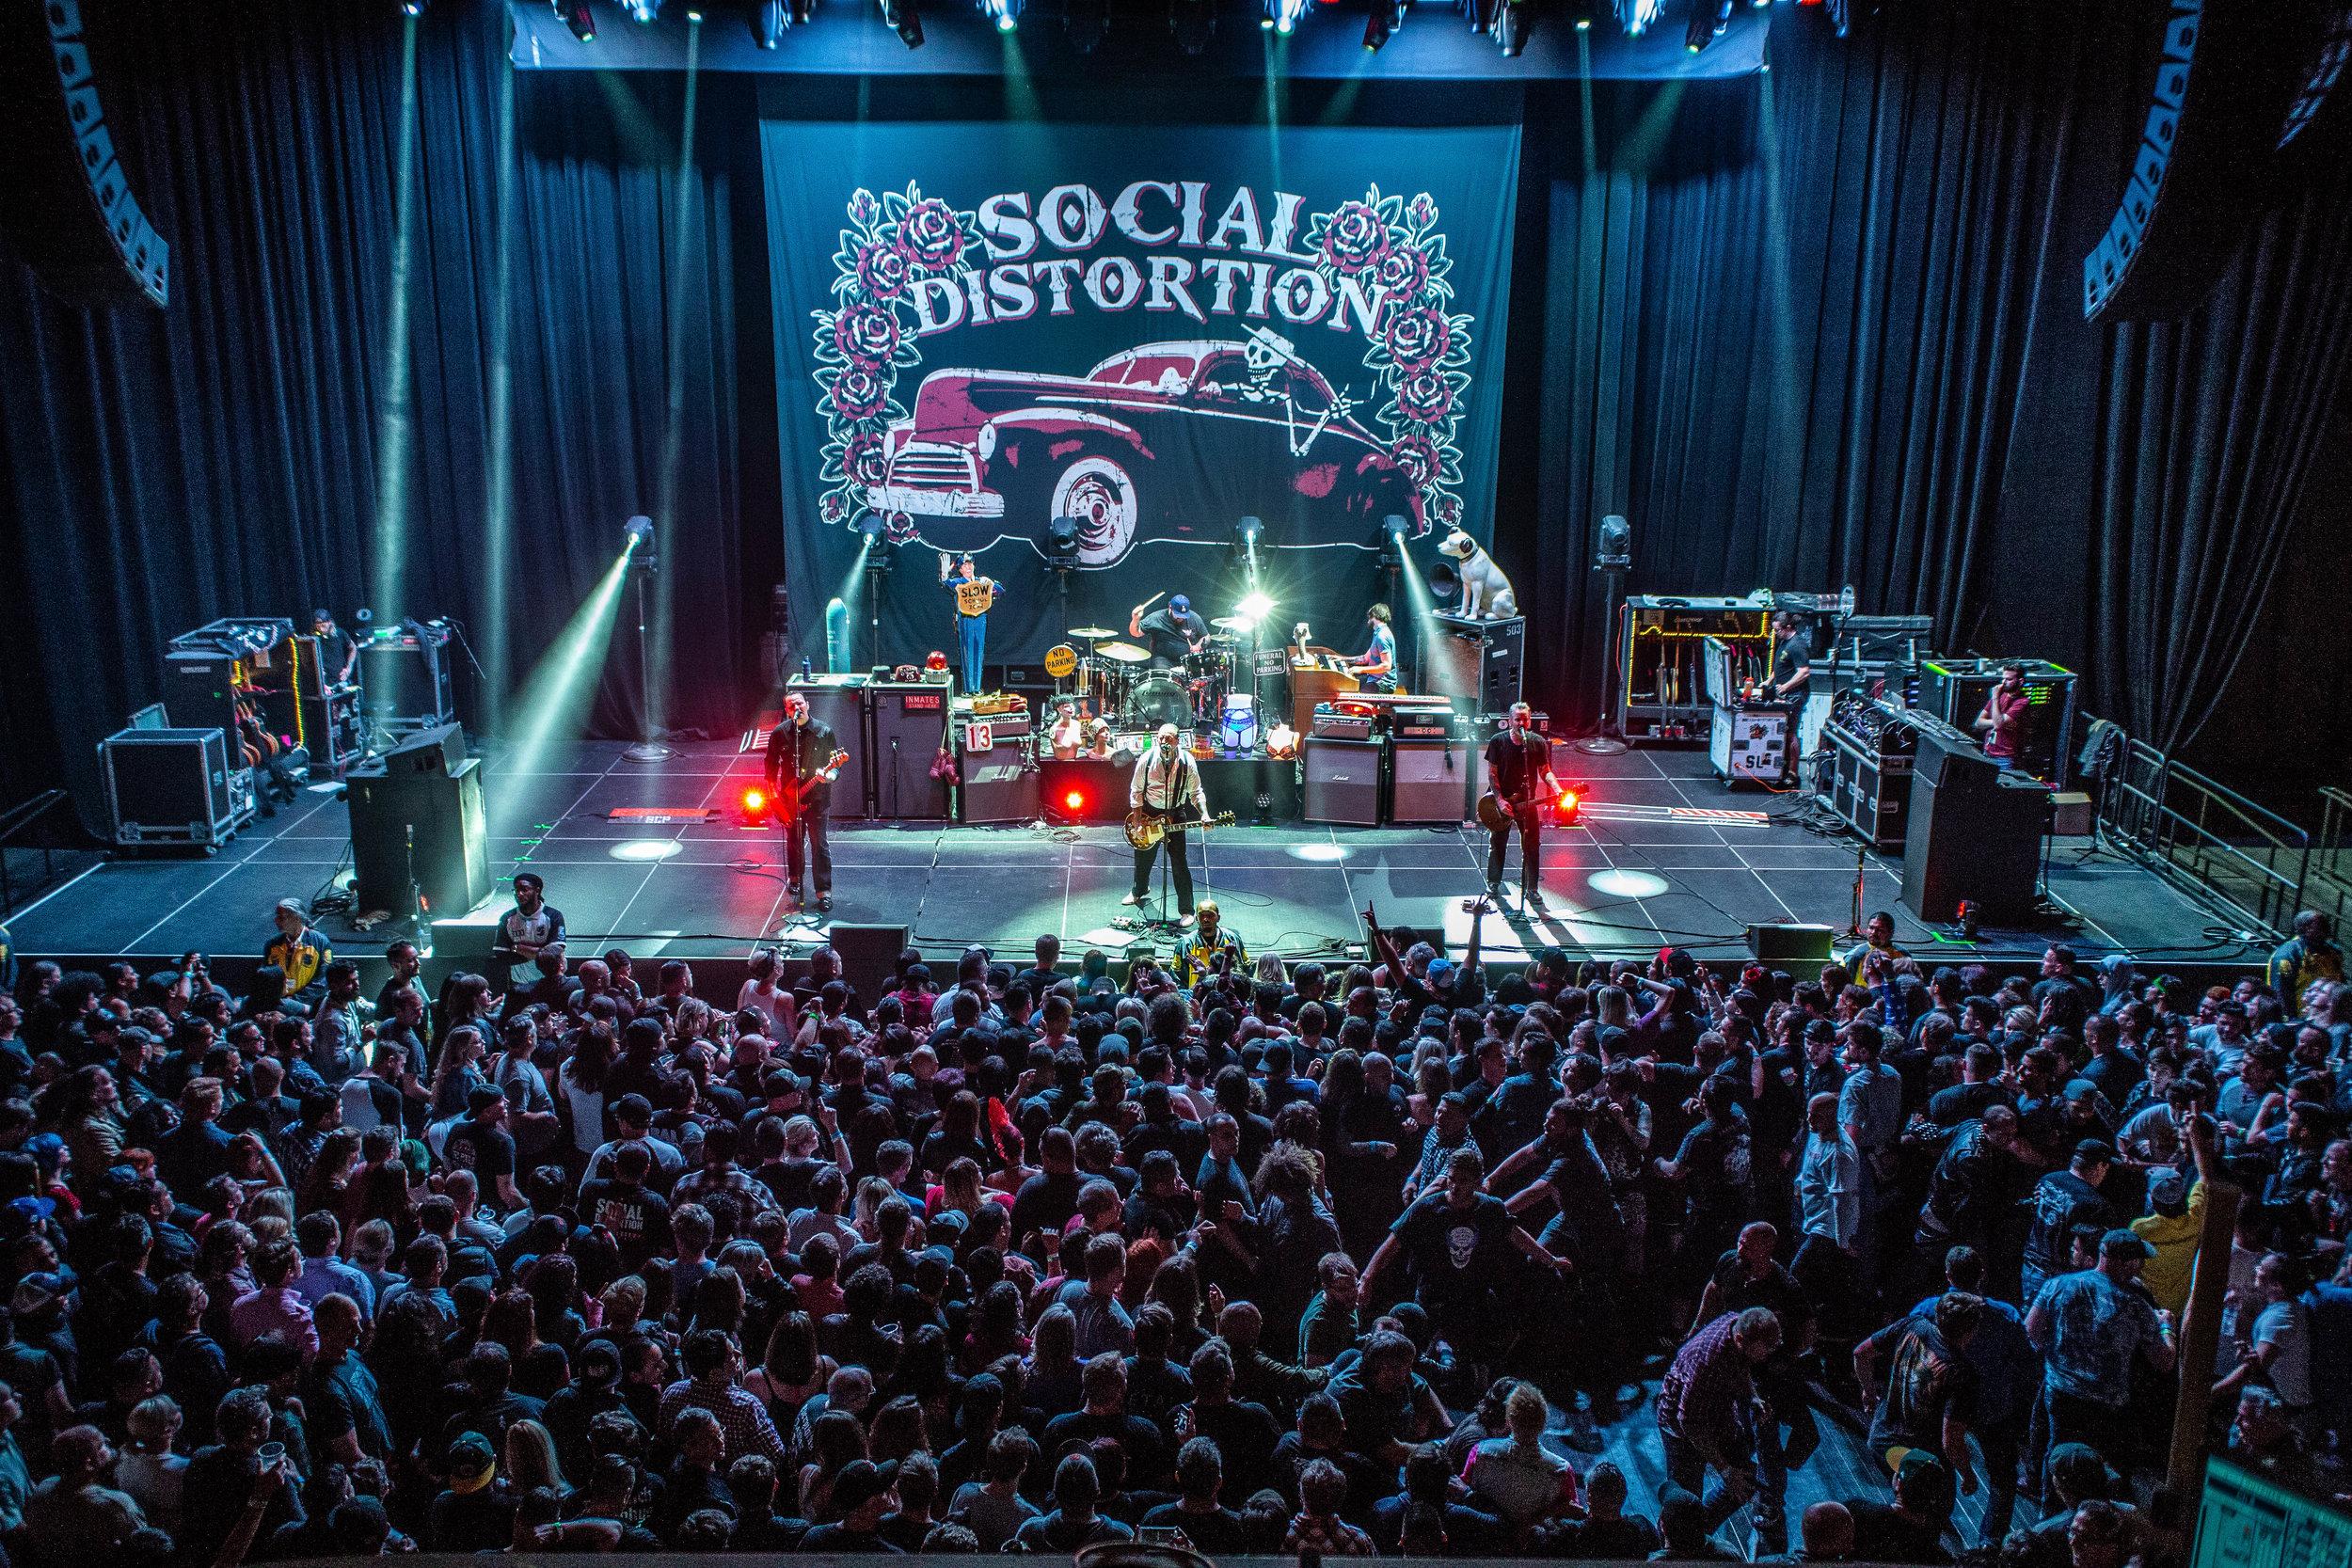 Social Distortion performing in San Francisco, CA. Photo Credit: Jared Stossel